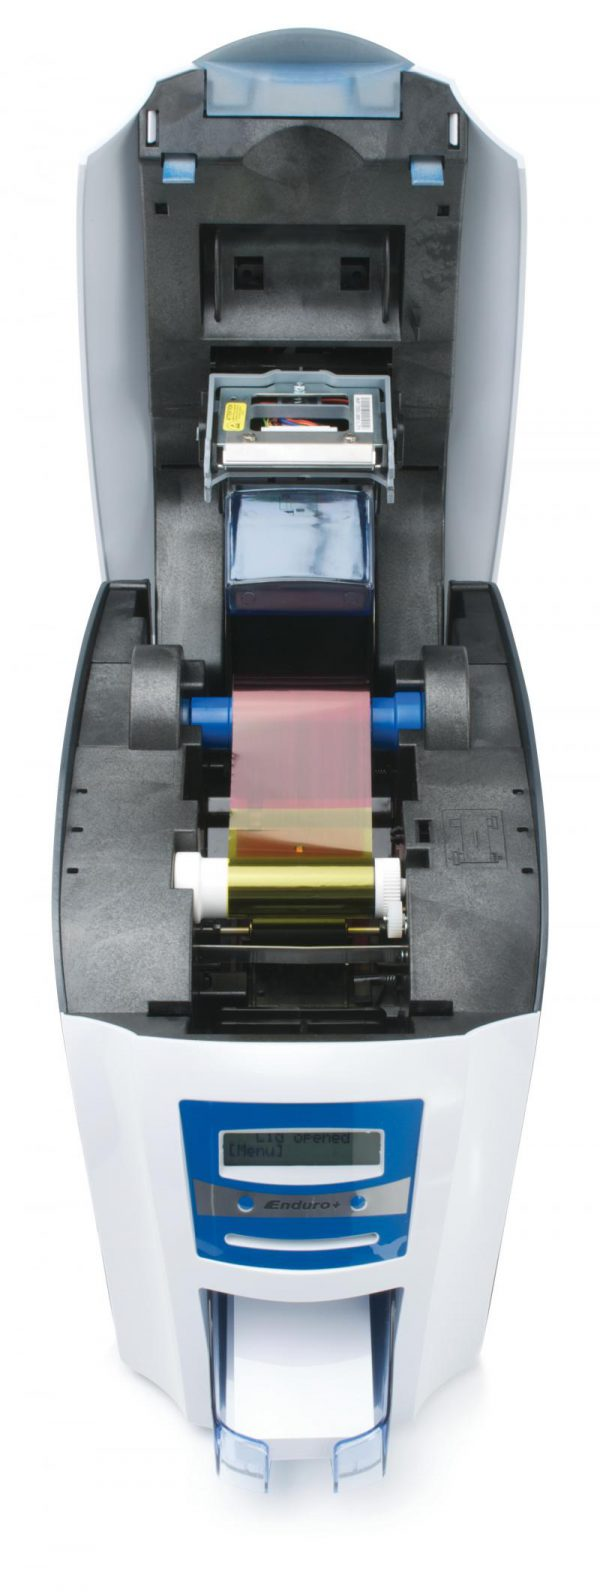 Magicard-kaartprinter-Enduro-dubbelzijdig-binnenkant-PPC